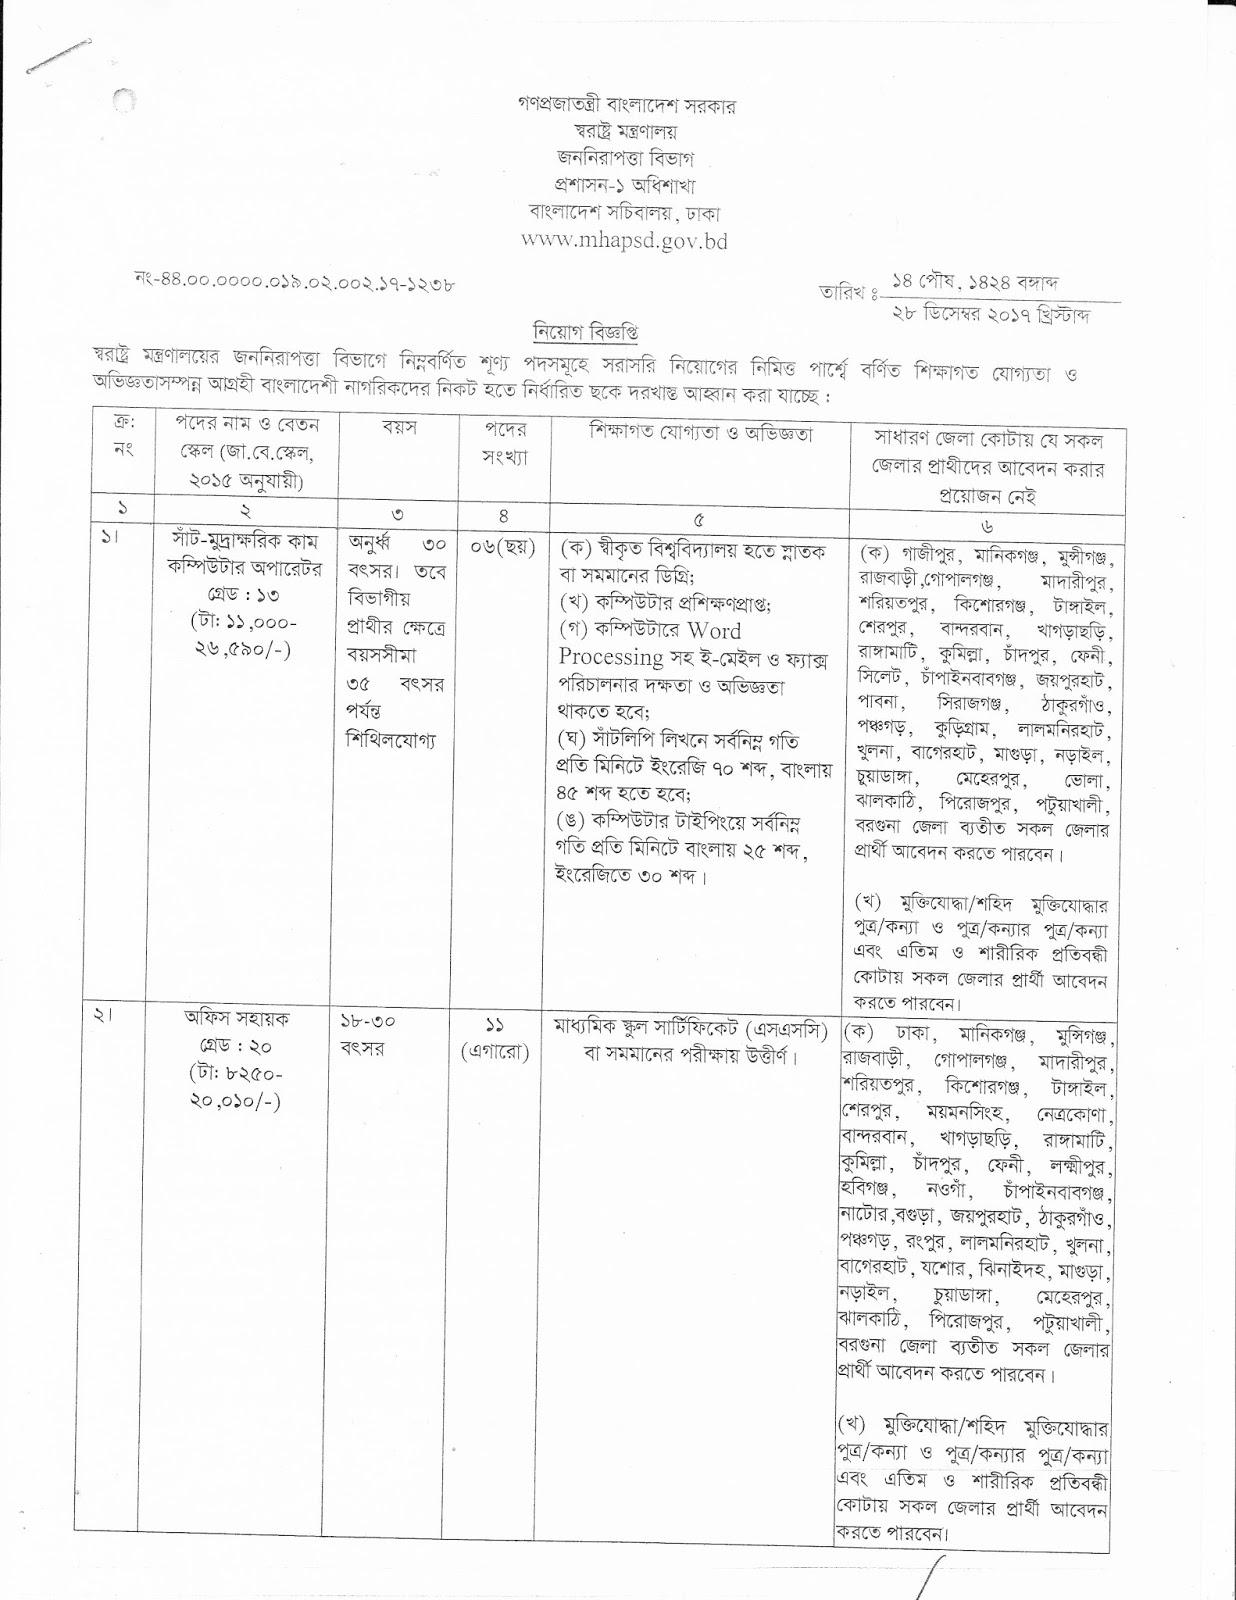 Public Security Division (PSD) Job Circular 2018